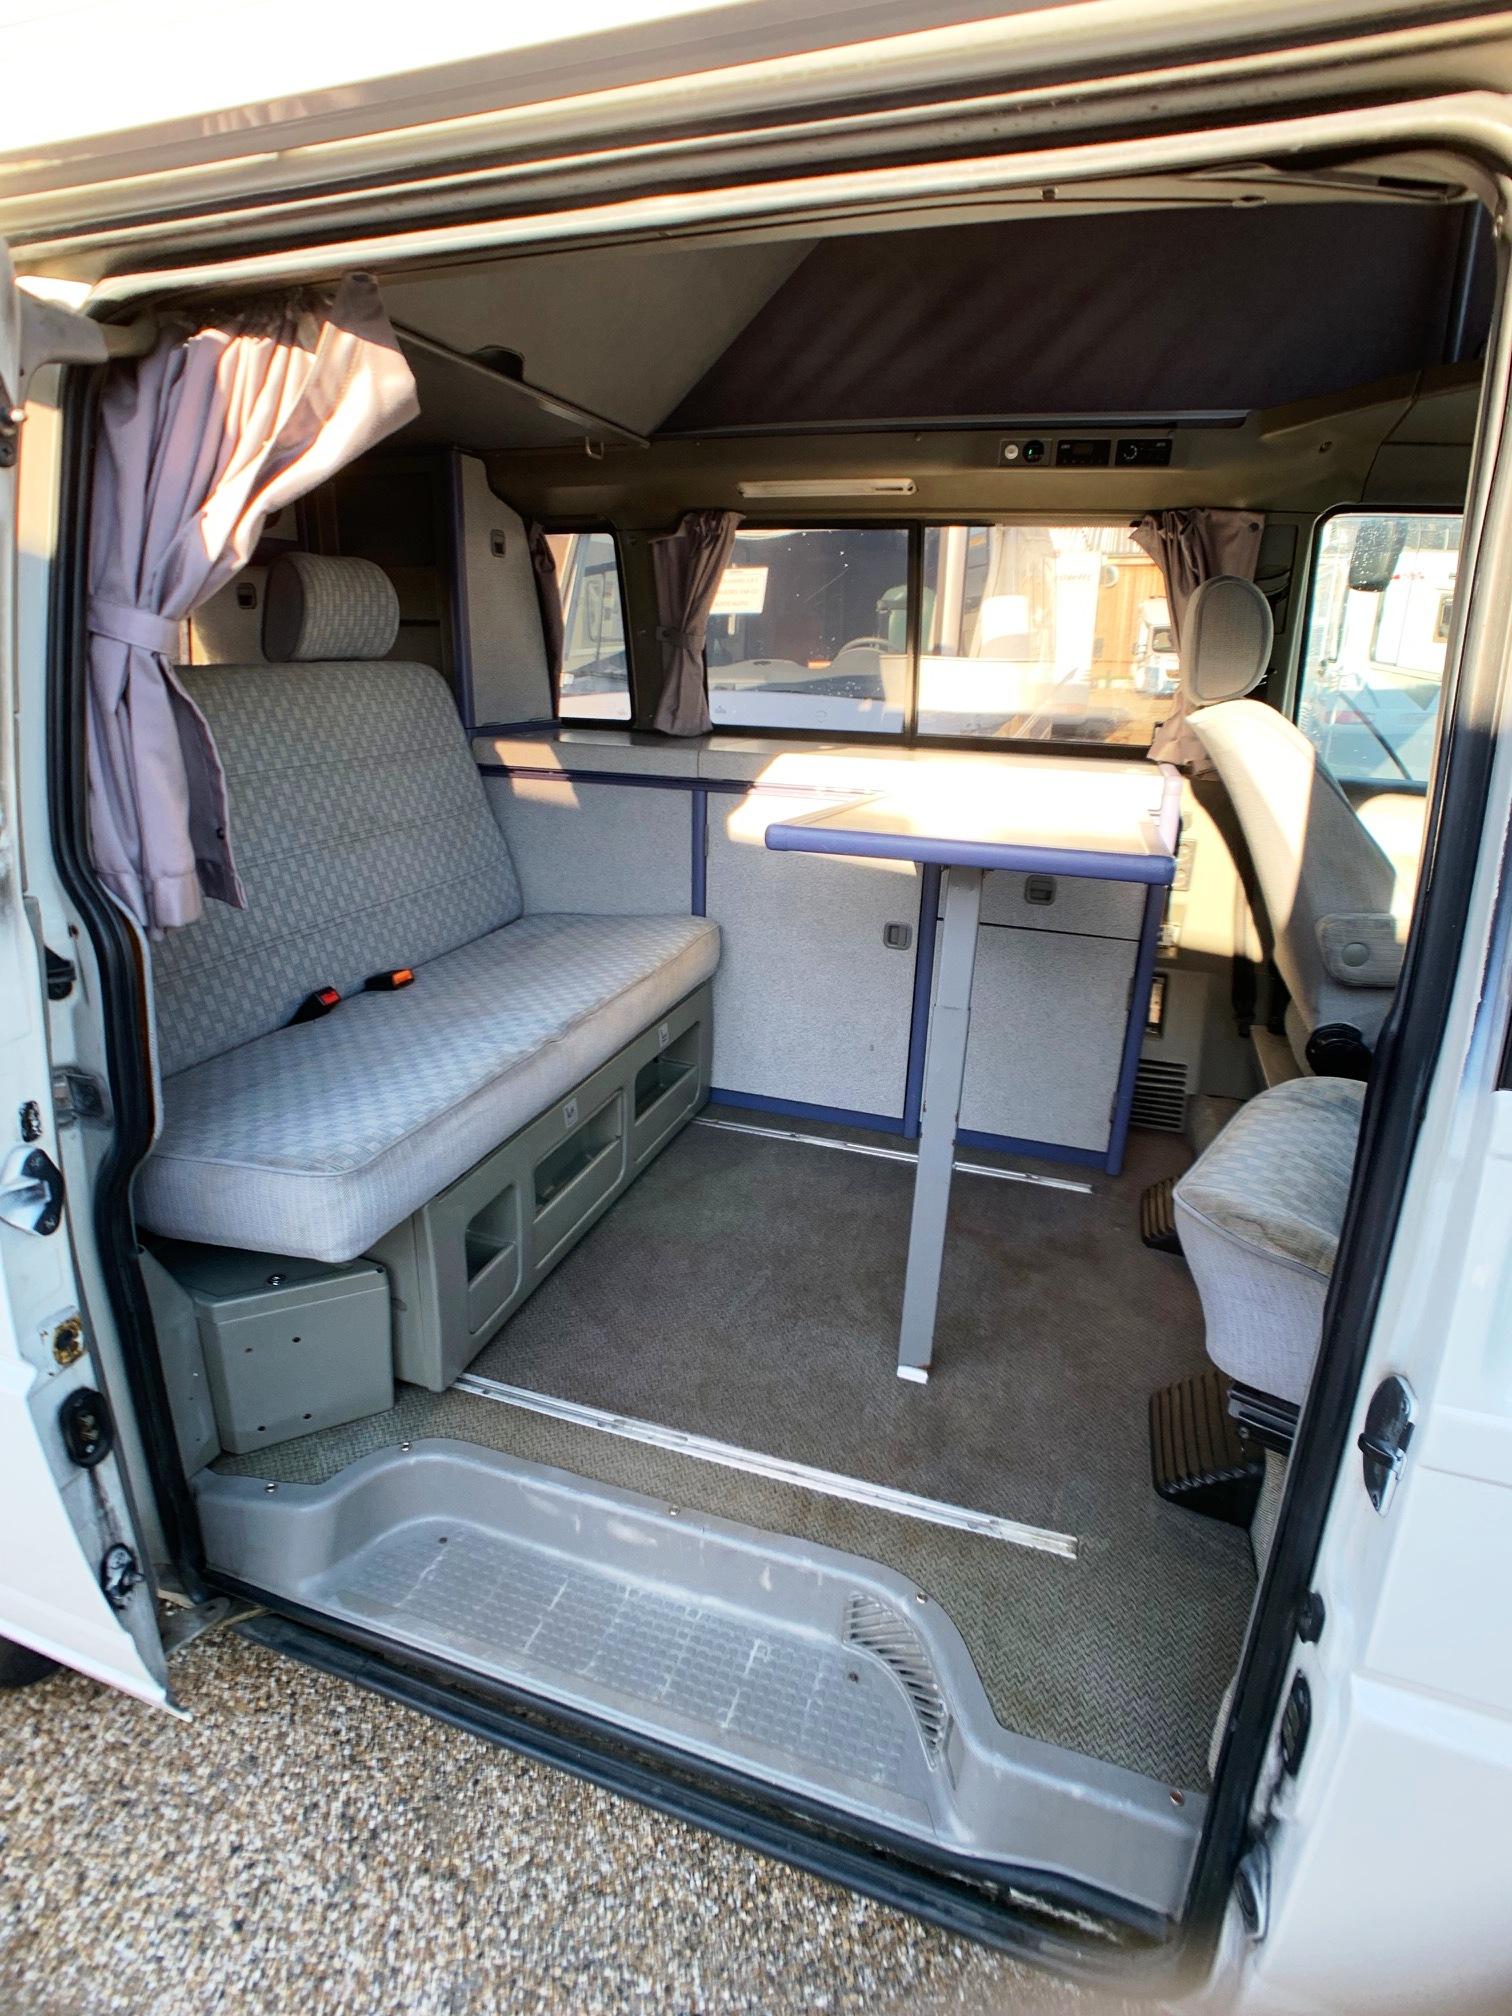 volkswagen t4 california occasion  porteur vw 2 5 tdi 102 cv